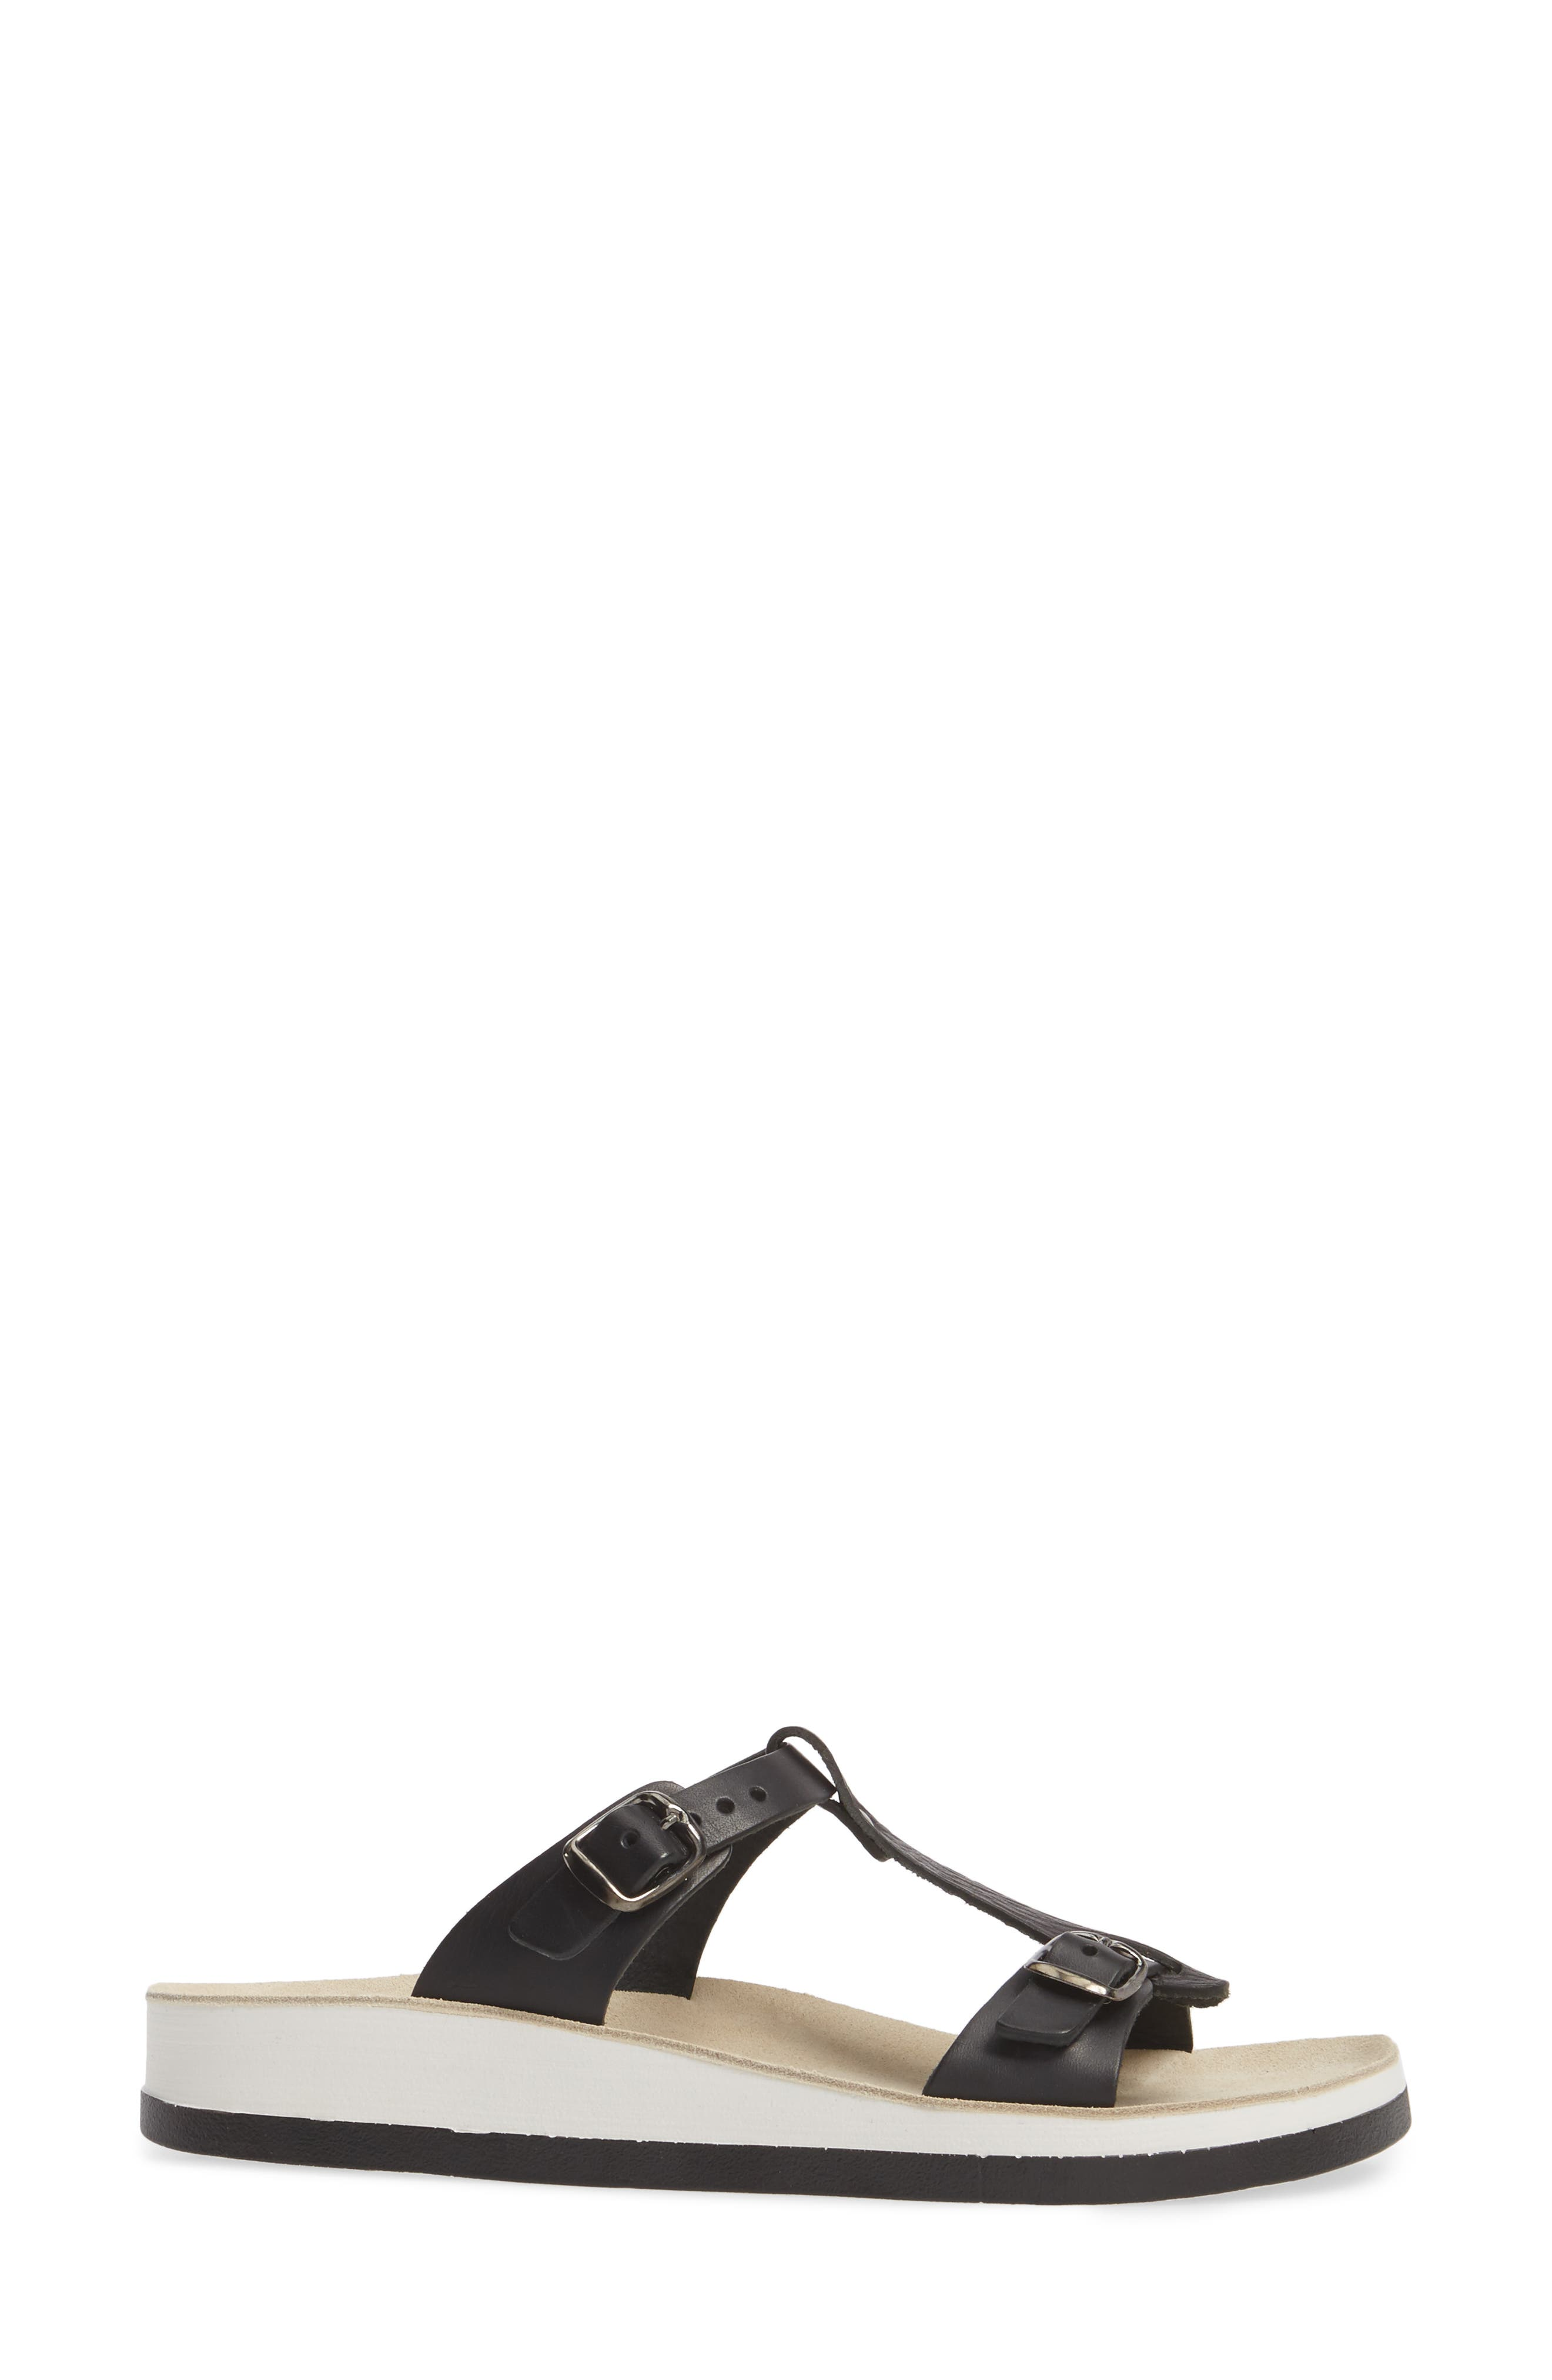 Jessamine T-Strap Sandal,                             Alternate thumbnail 3, color,                             Black Volcano Leather